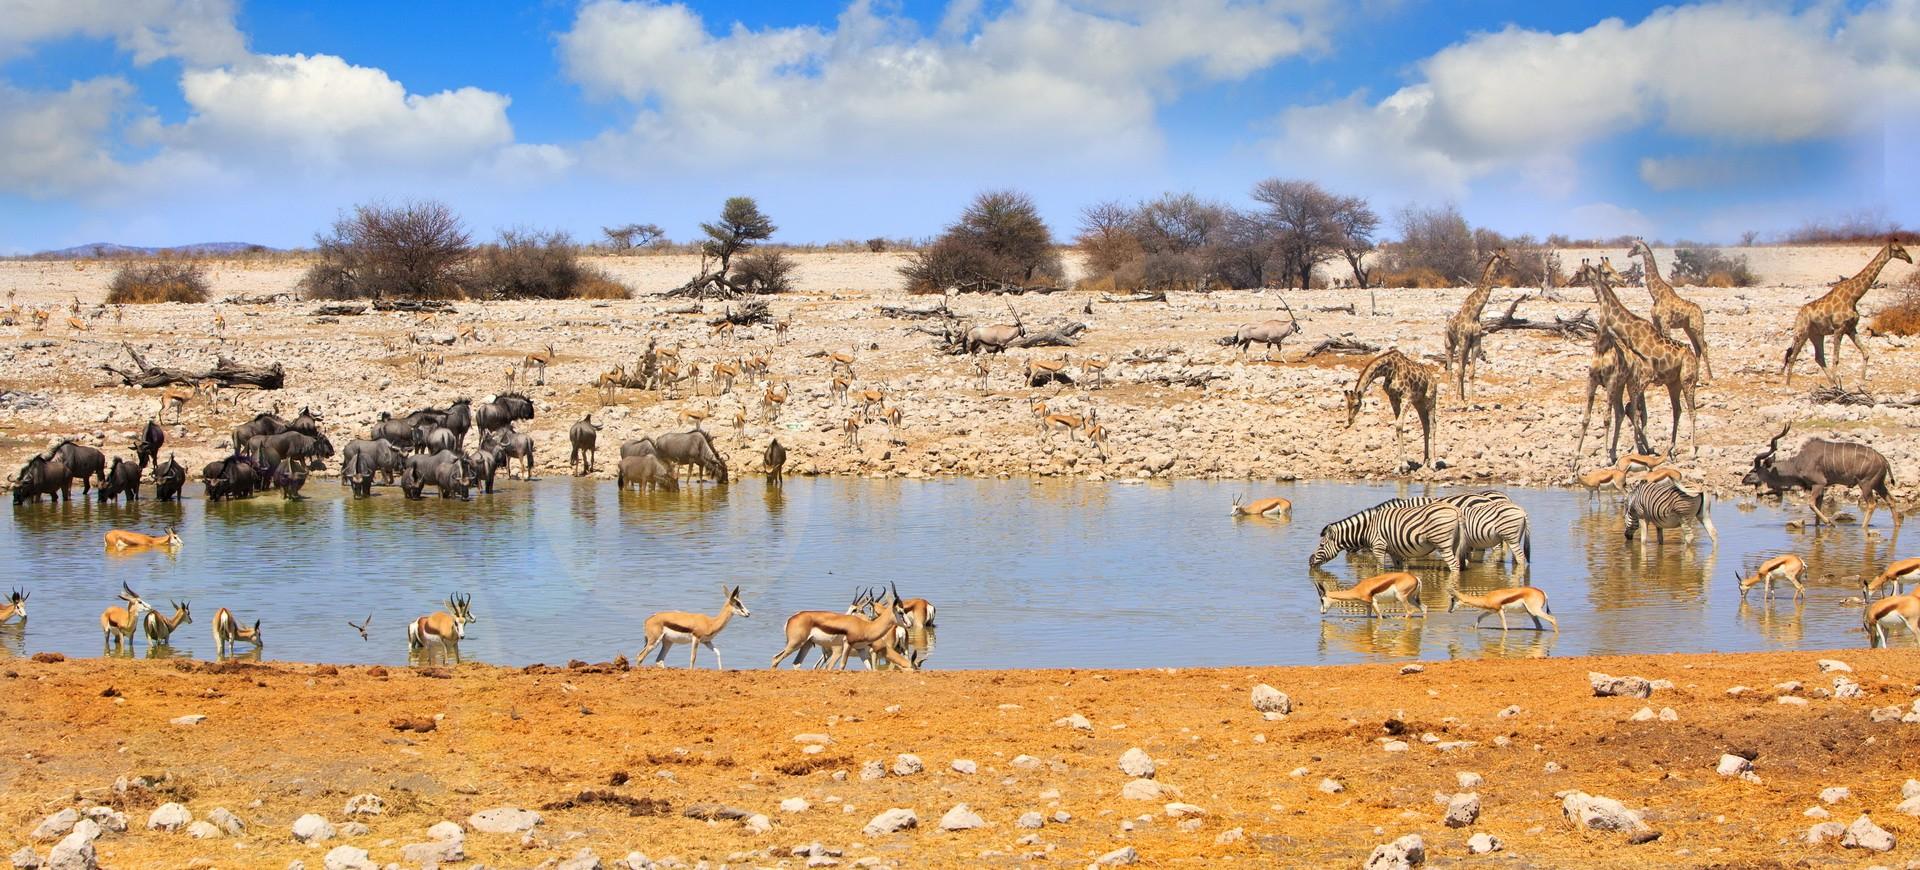 Namibie Parc d'Etosha